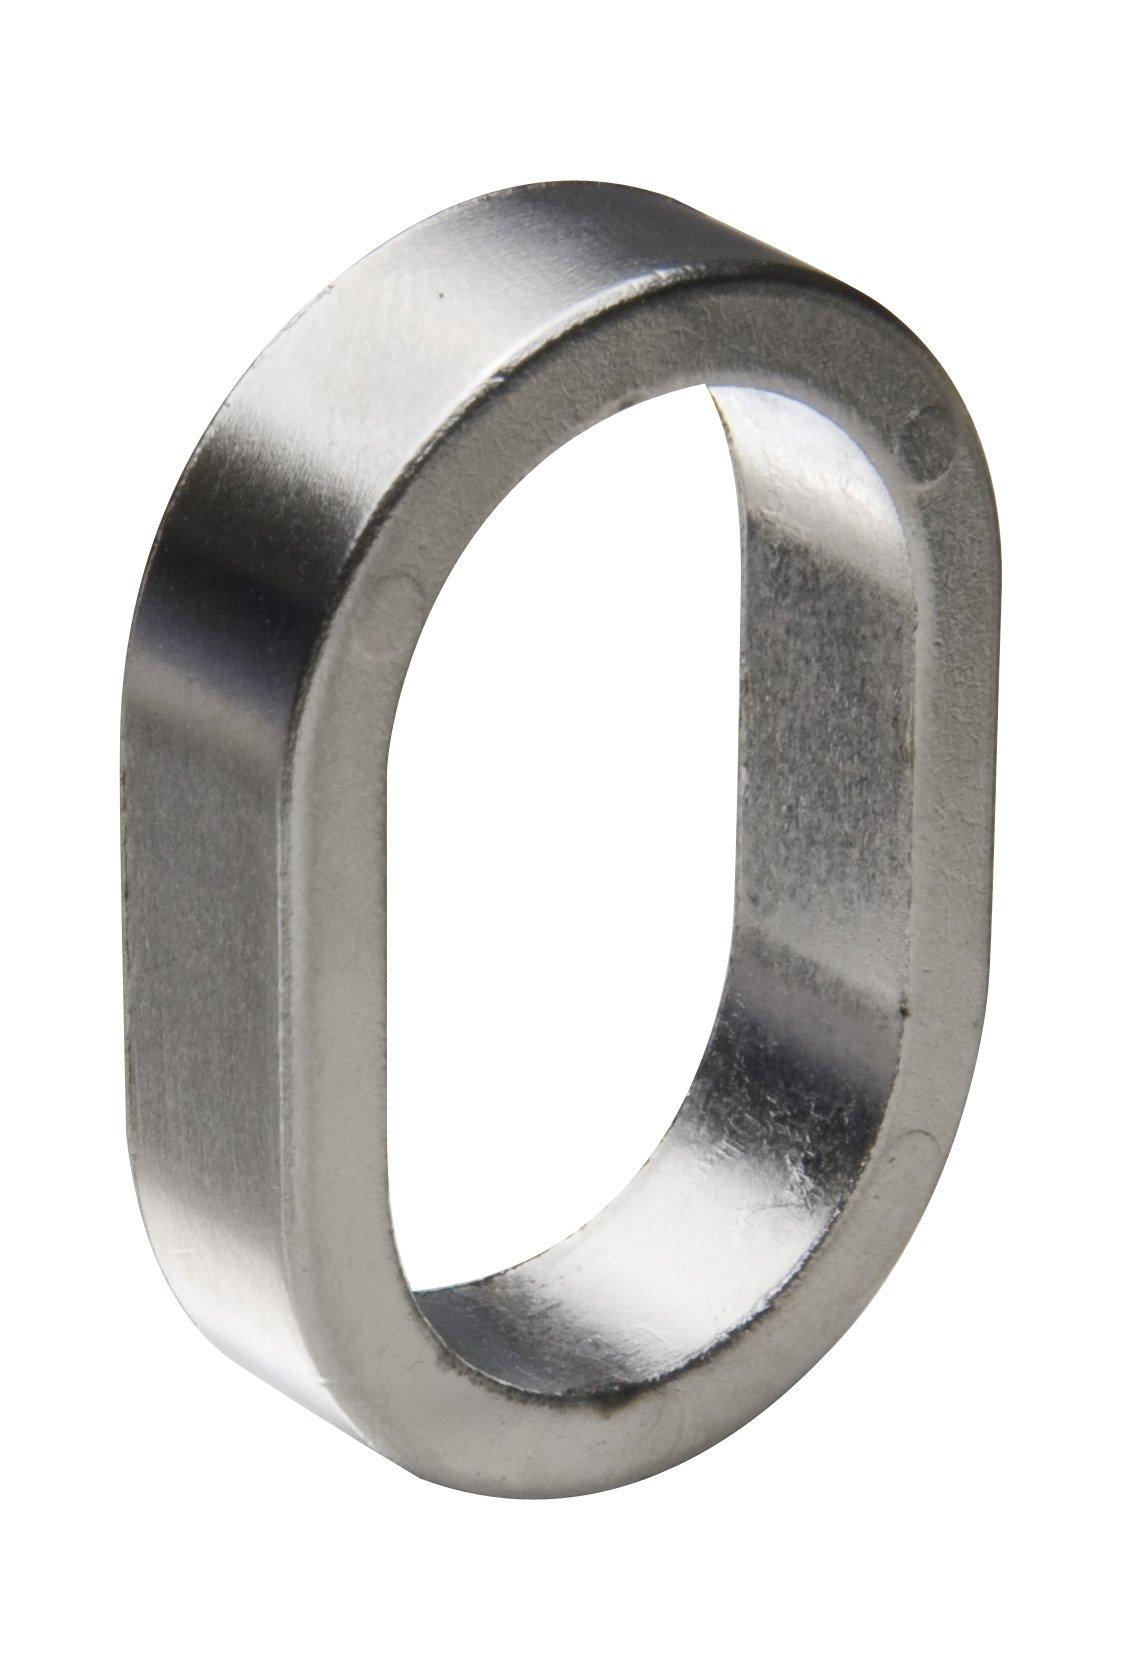 Distansring 10 mm